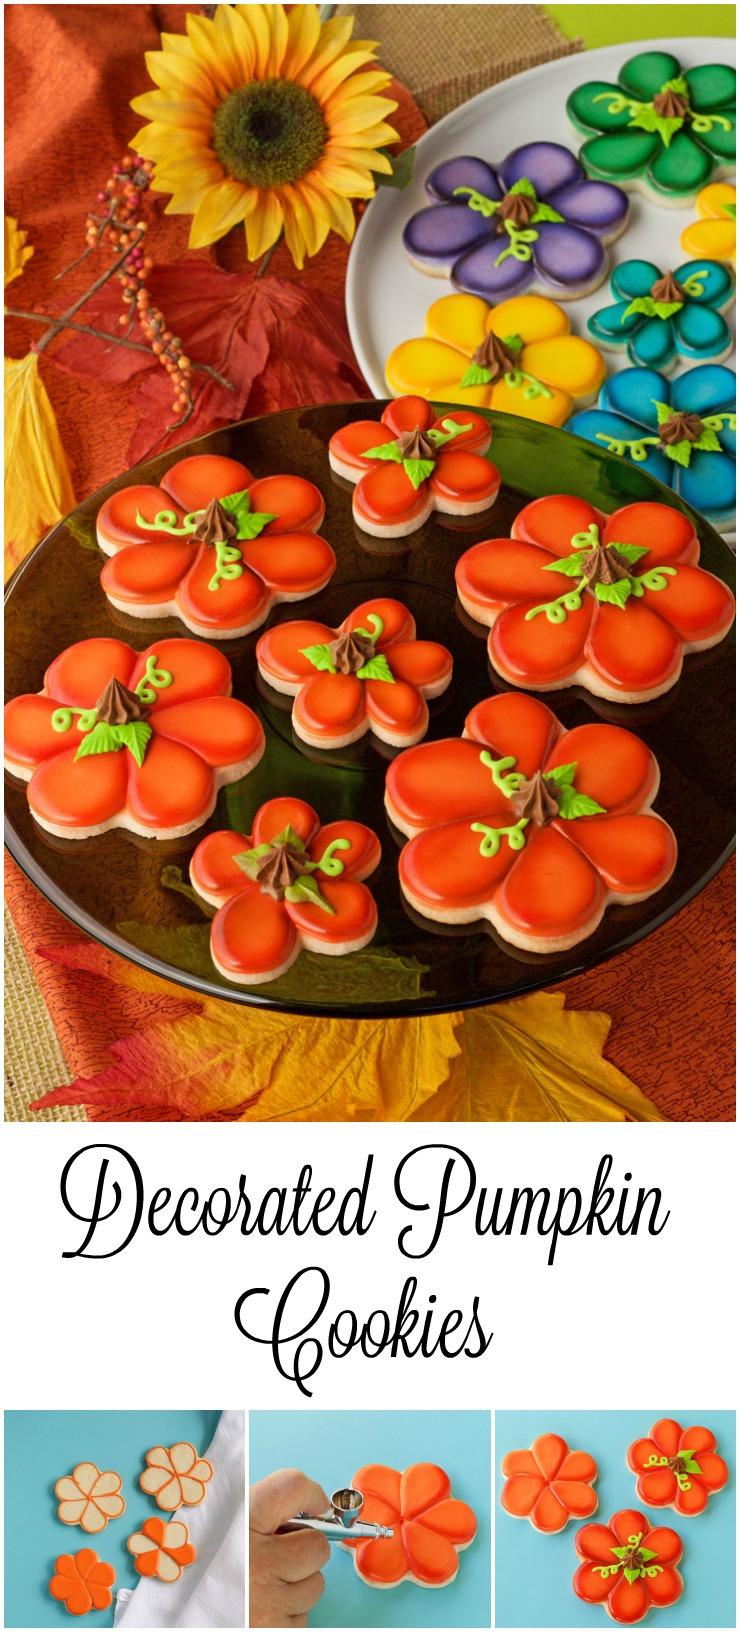 Decorated Pumpkin Cookies   The Bearfoot Baker